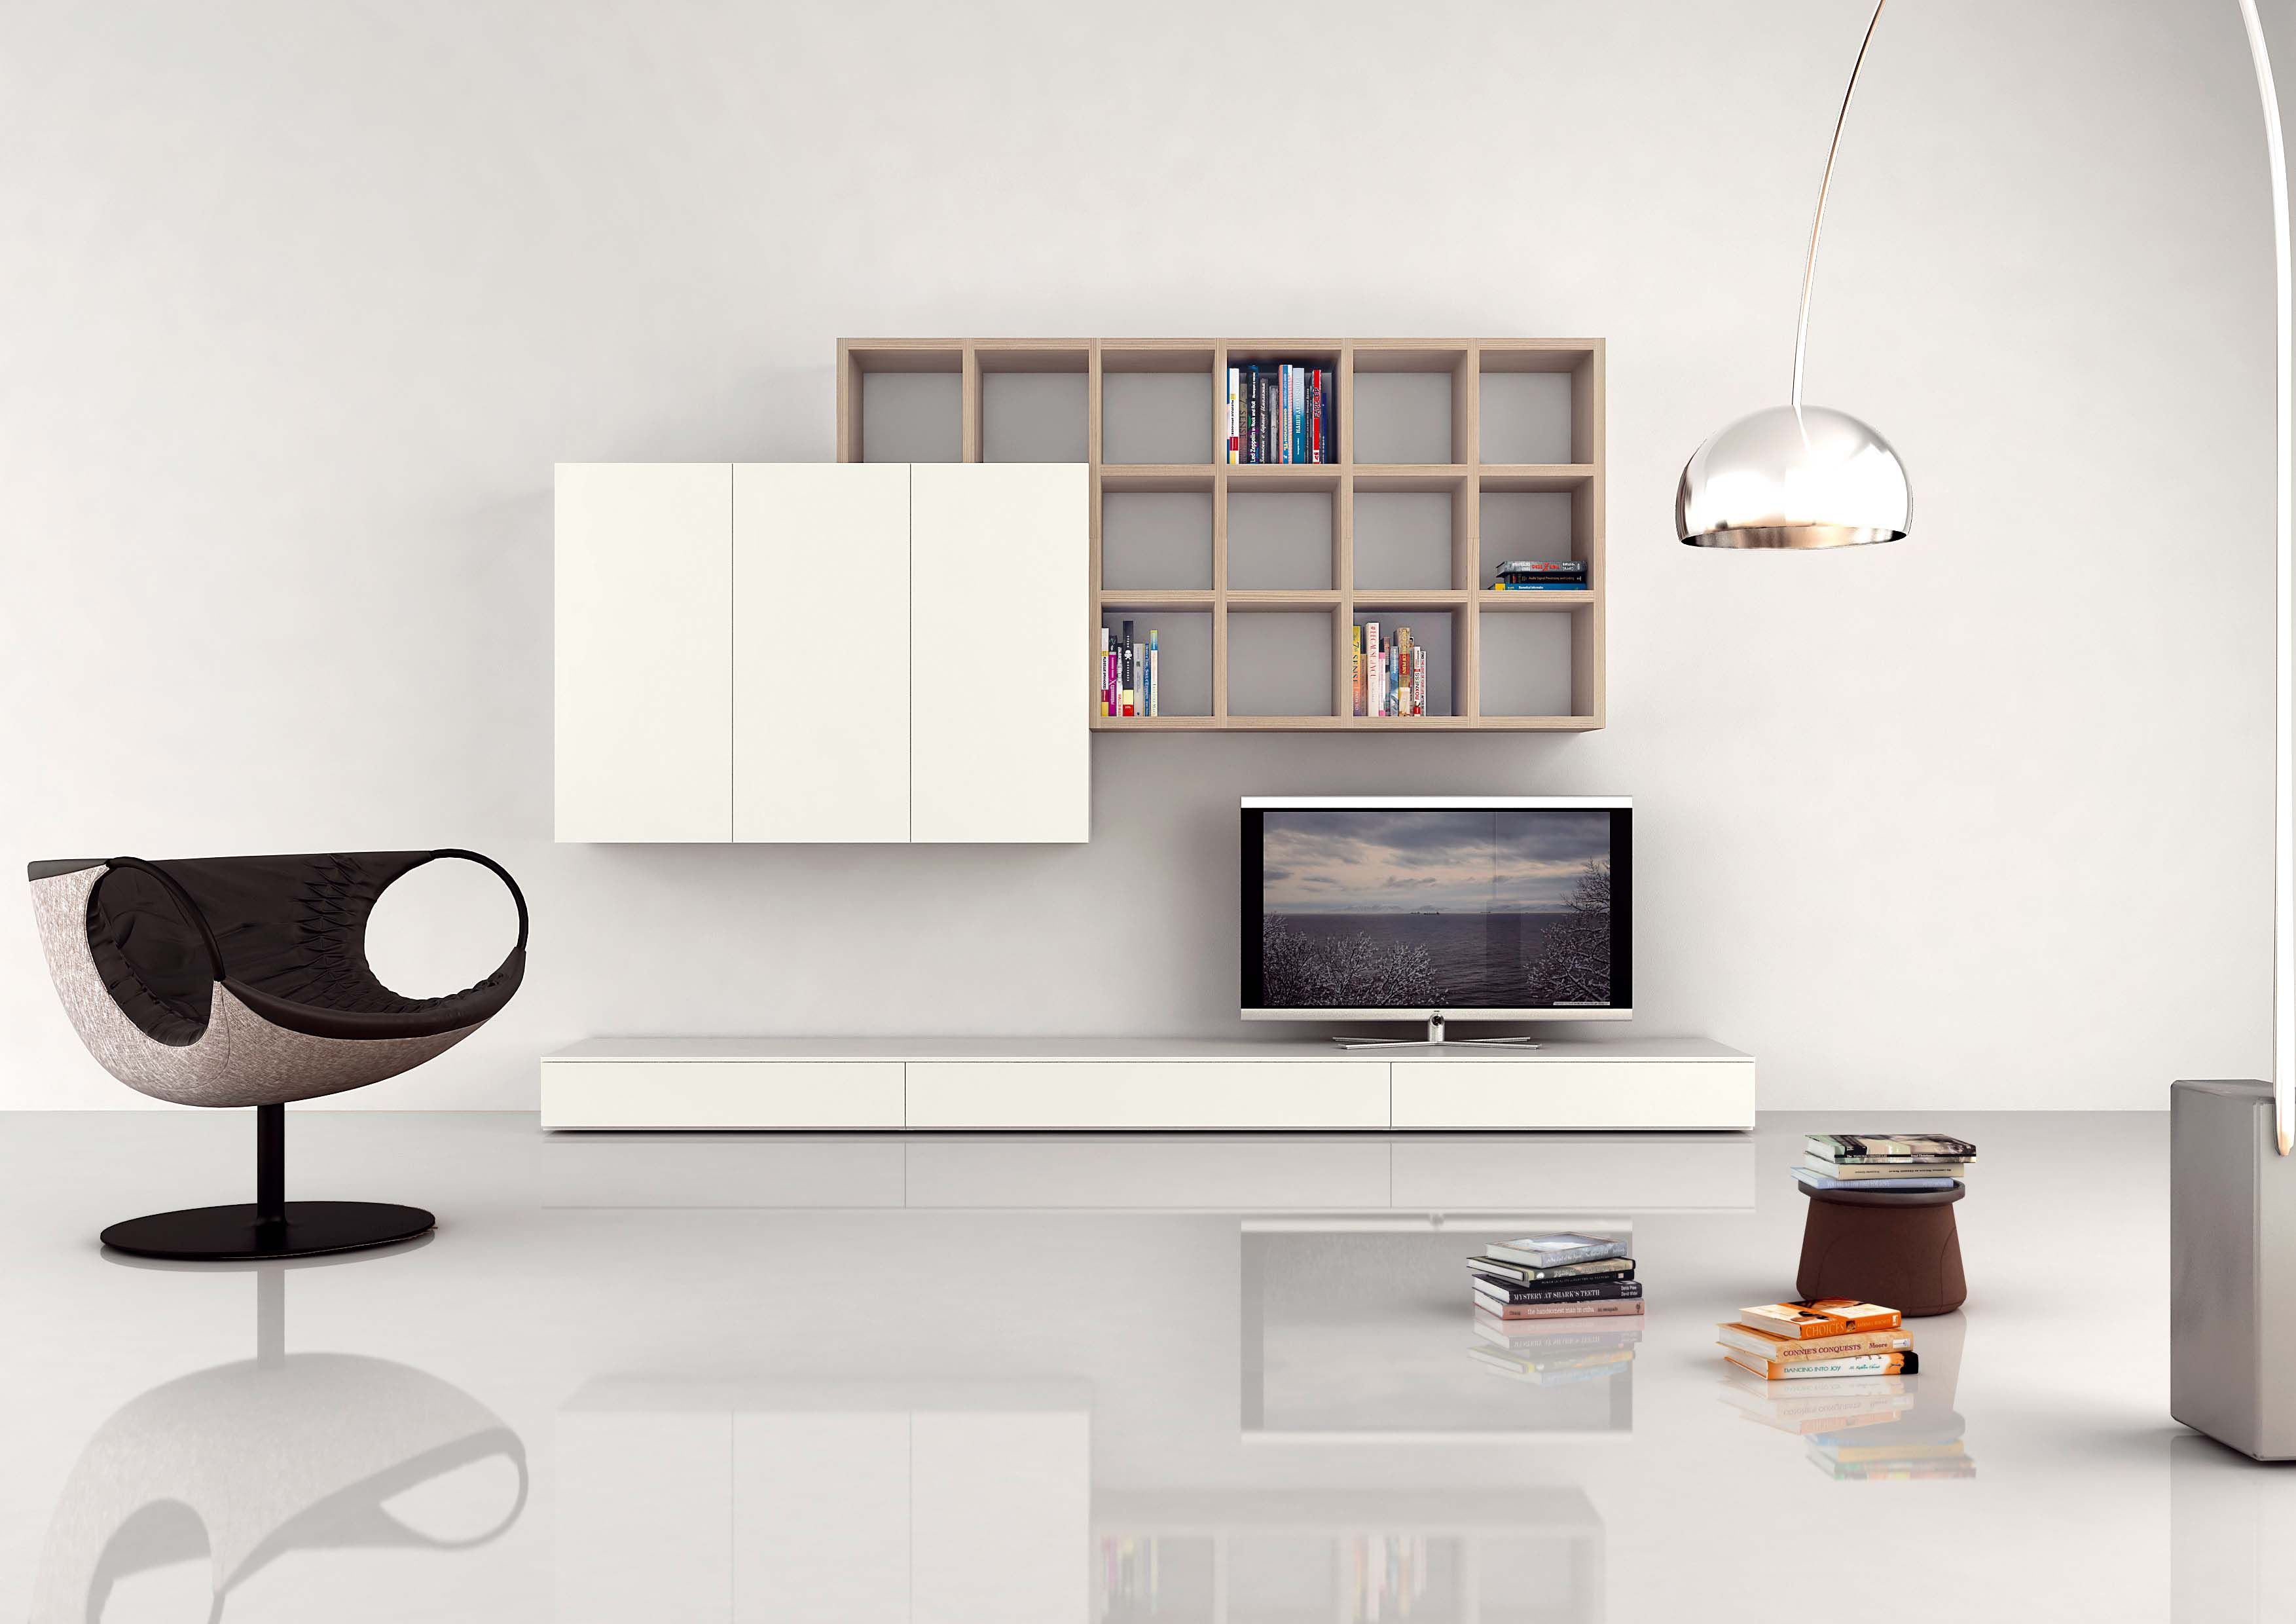 moderne wohnzimmer wohnzimmer modern wohnzimmer im modernen stil innenarchitektur. Black Bedroom Furniture Sets. Home Design Ideas